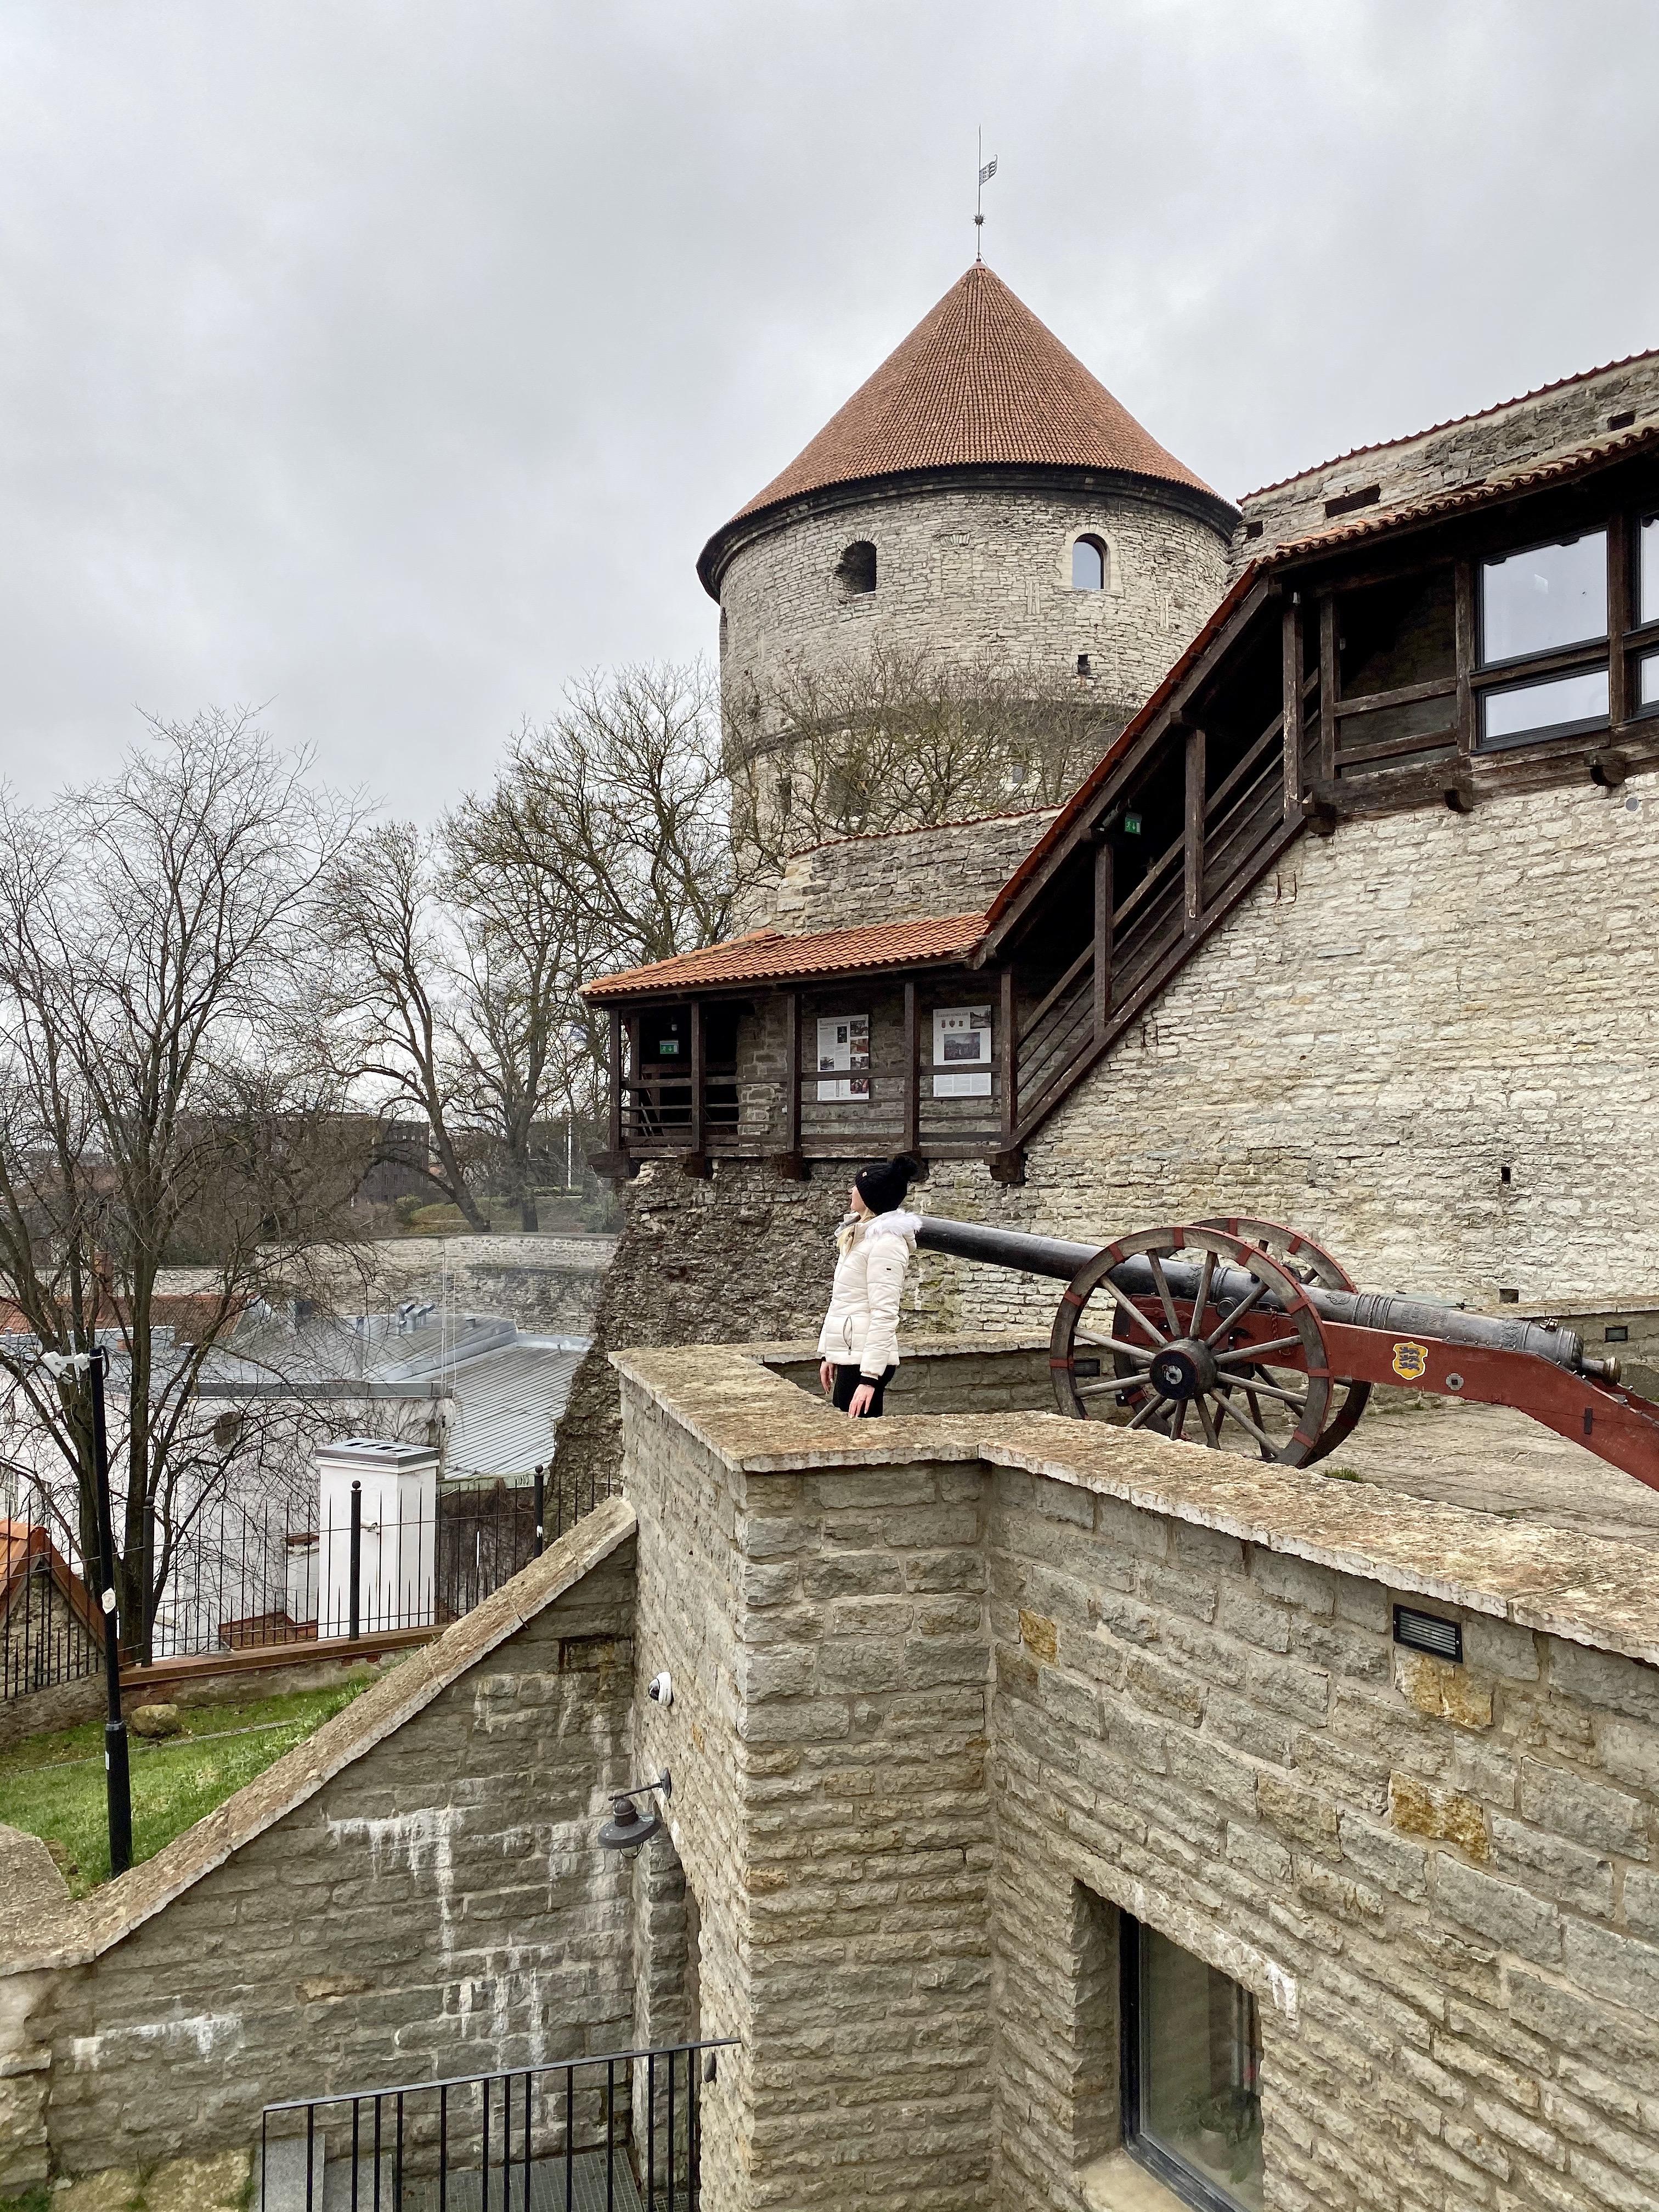 Erinn standing by a cannon at the Danish King's Garden in Tallinn, Estonia.